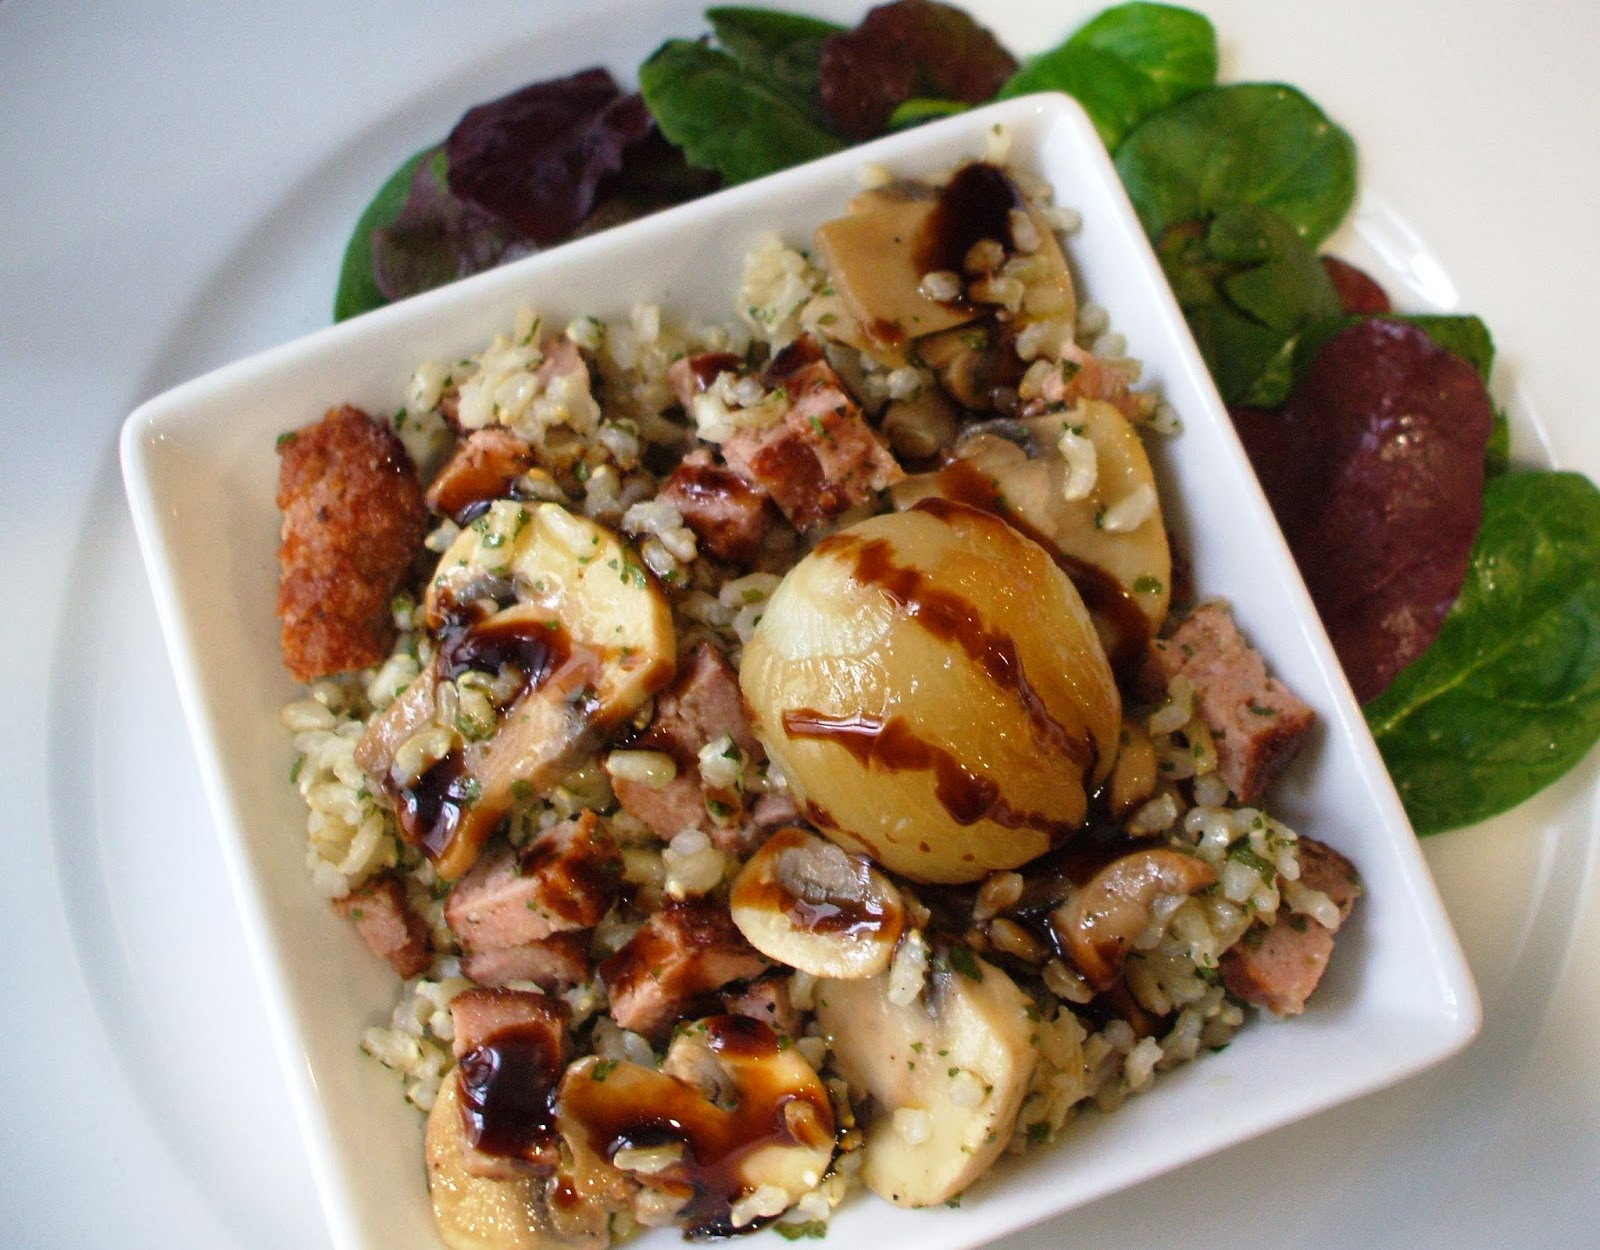 Misamigoscocinan ensalada de arroz integral - Ensalada de arroz light ...